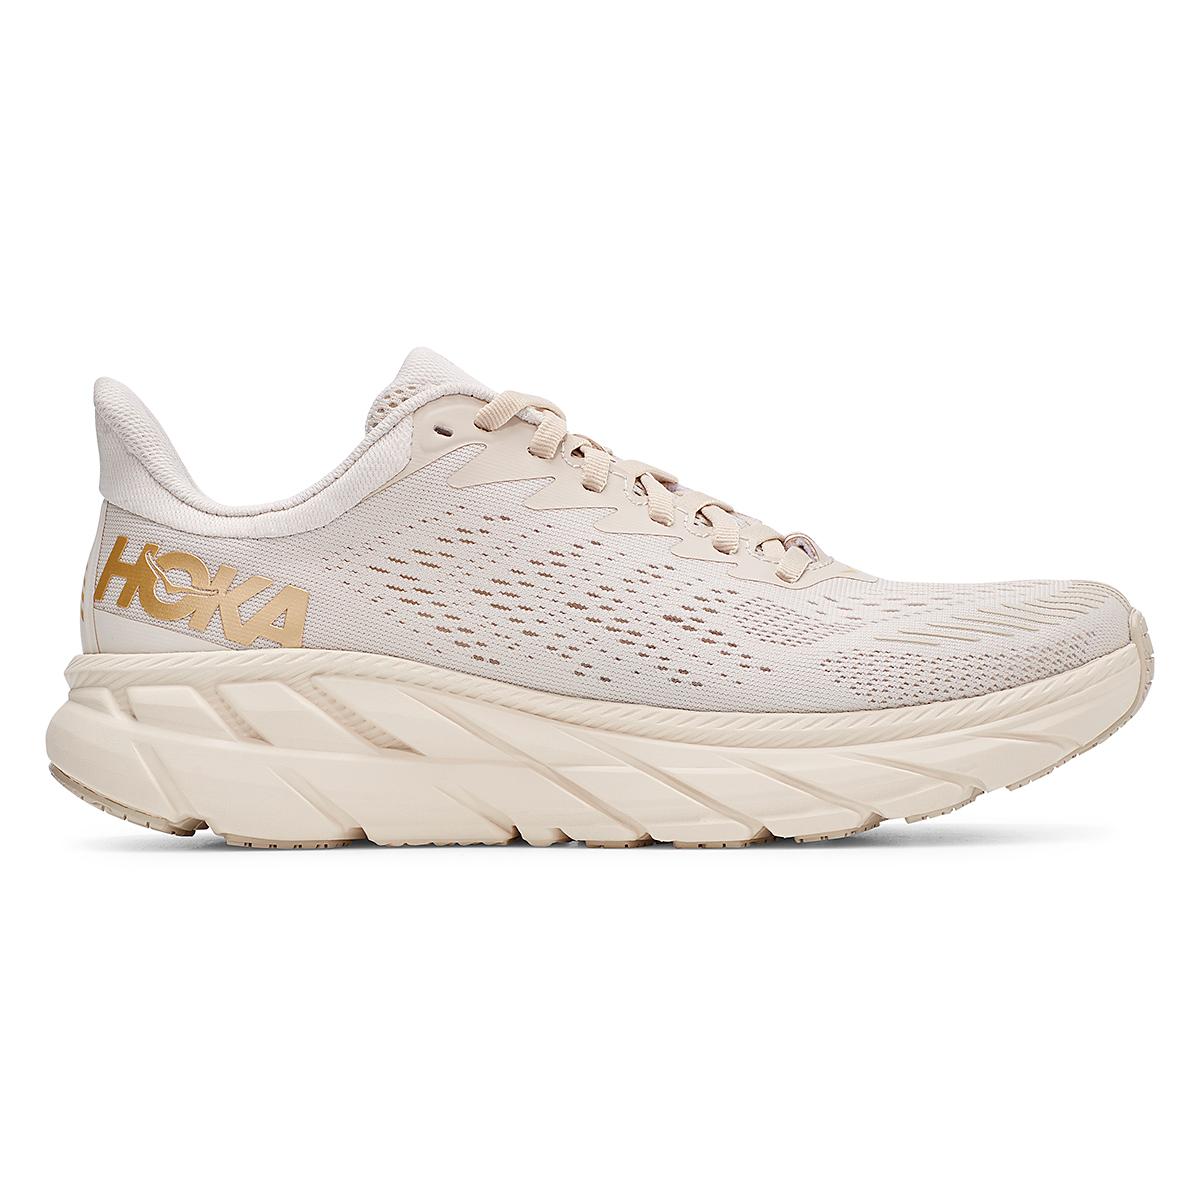 Women's Hoka One One Clifton 7 Running Shoe - Color: Almond Milk/Bronze - Size: 5 - Width: Regular, Almond Milk/Bronze, large, image 1